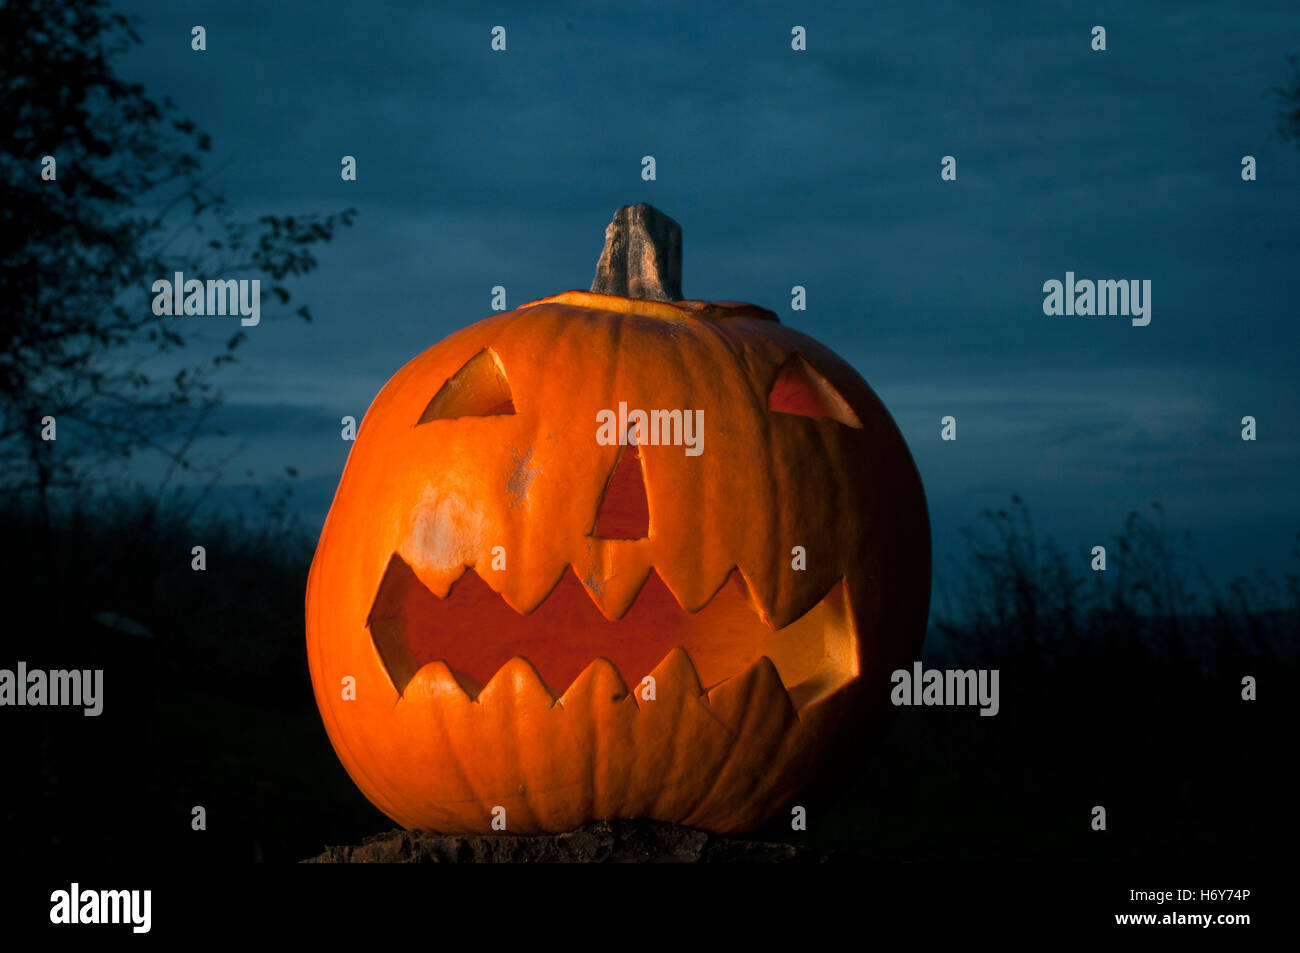 Ein Kürbis für Halloween. Stockbild